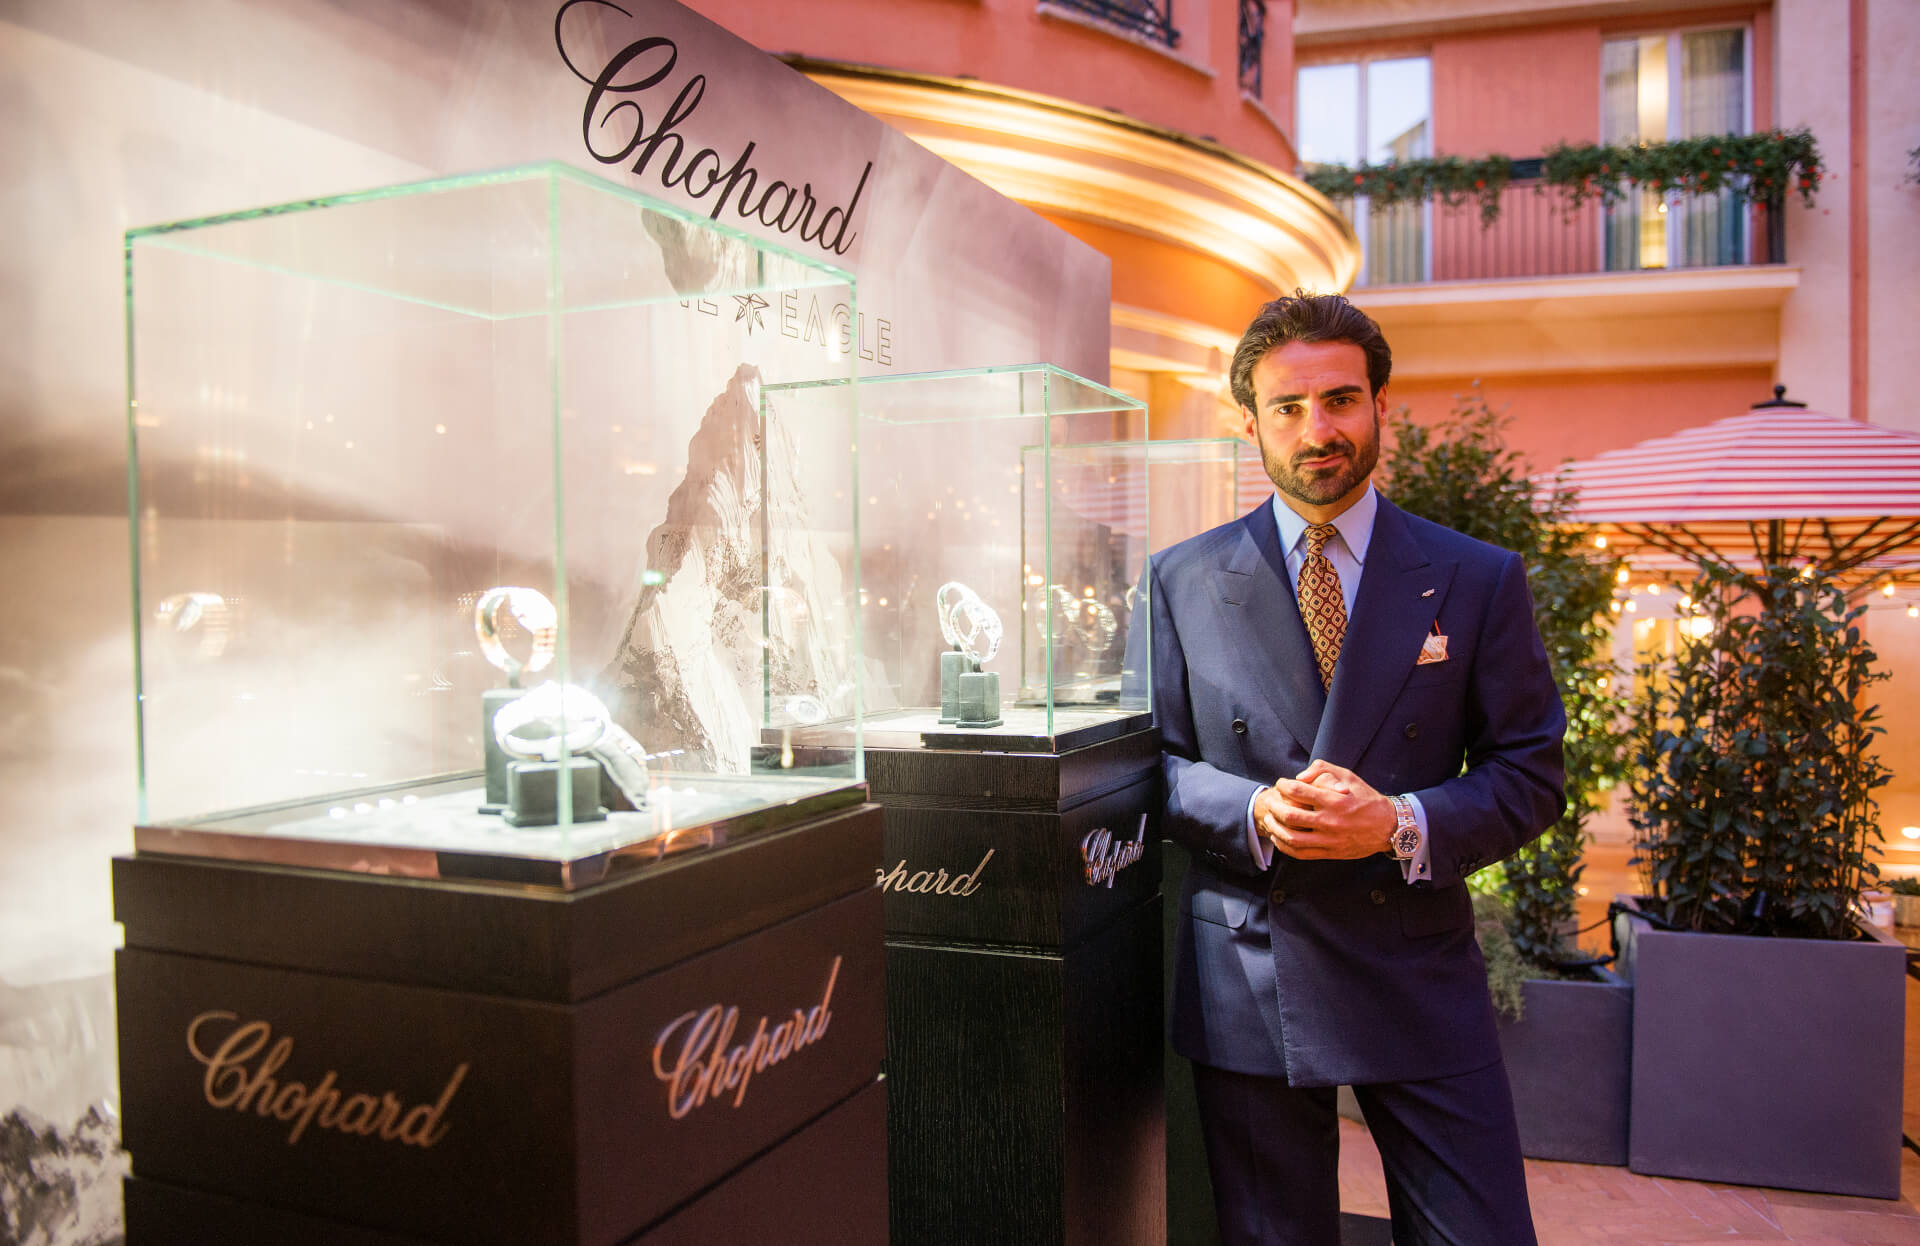 Giorgio Giangiulio